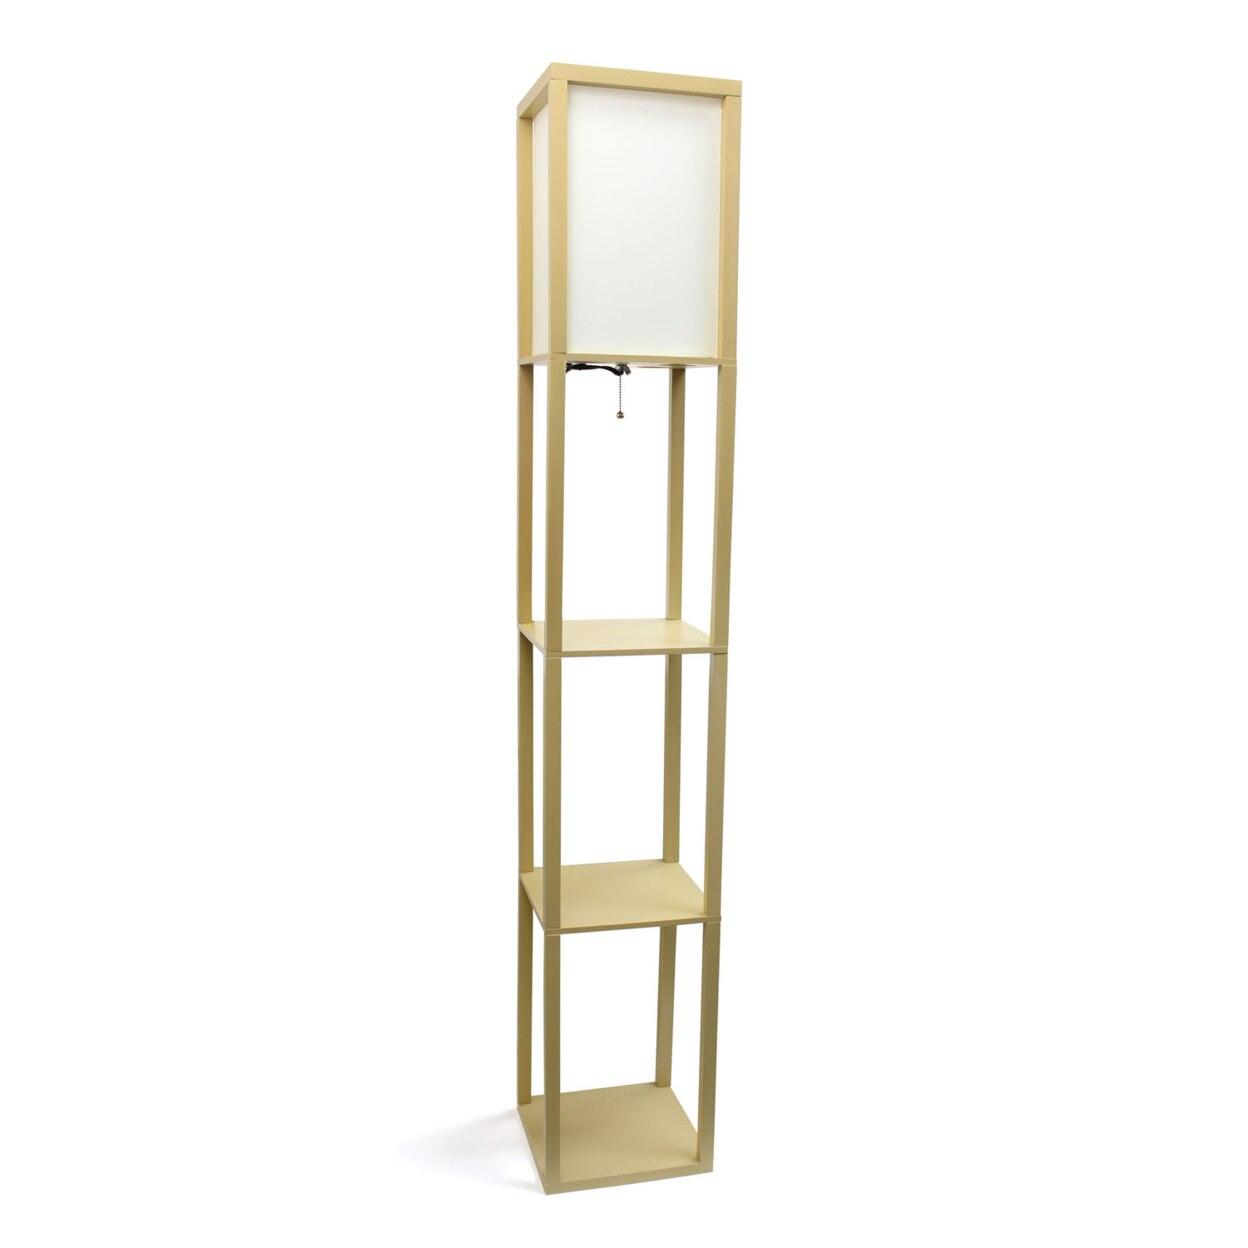 Simple Designs Floor Lamp Etagere Organizer Storage Shelf Linen Shade - Additional Colors (1)